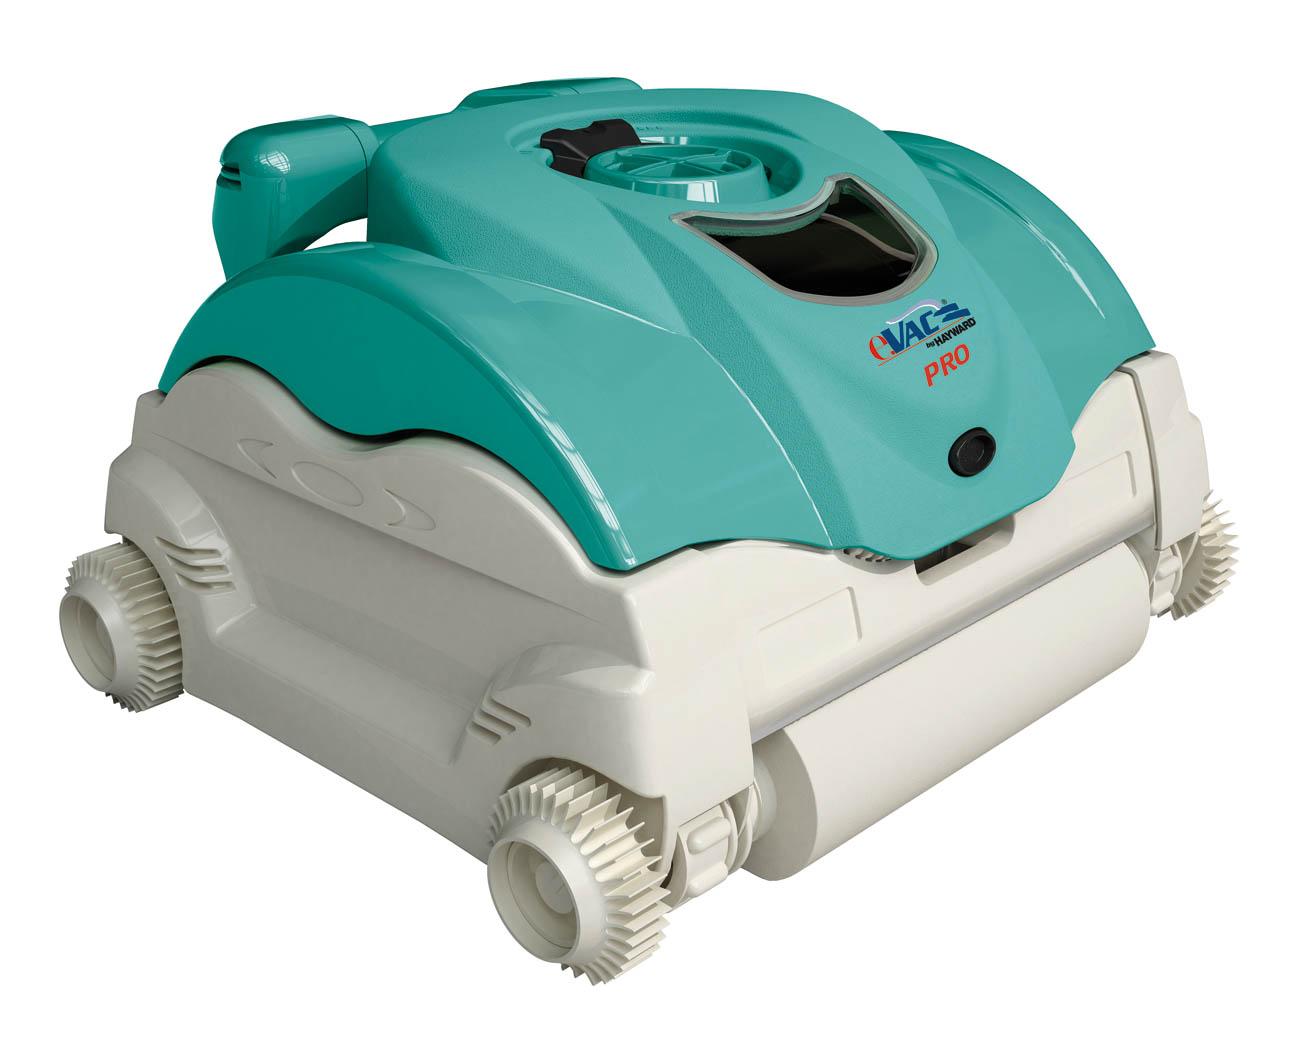 Robot limpiafondos piscina Evac Pro